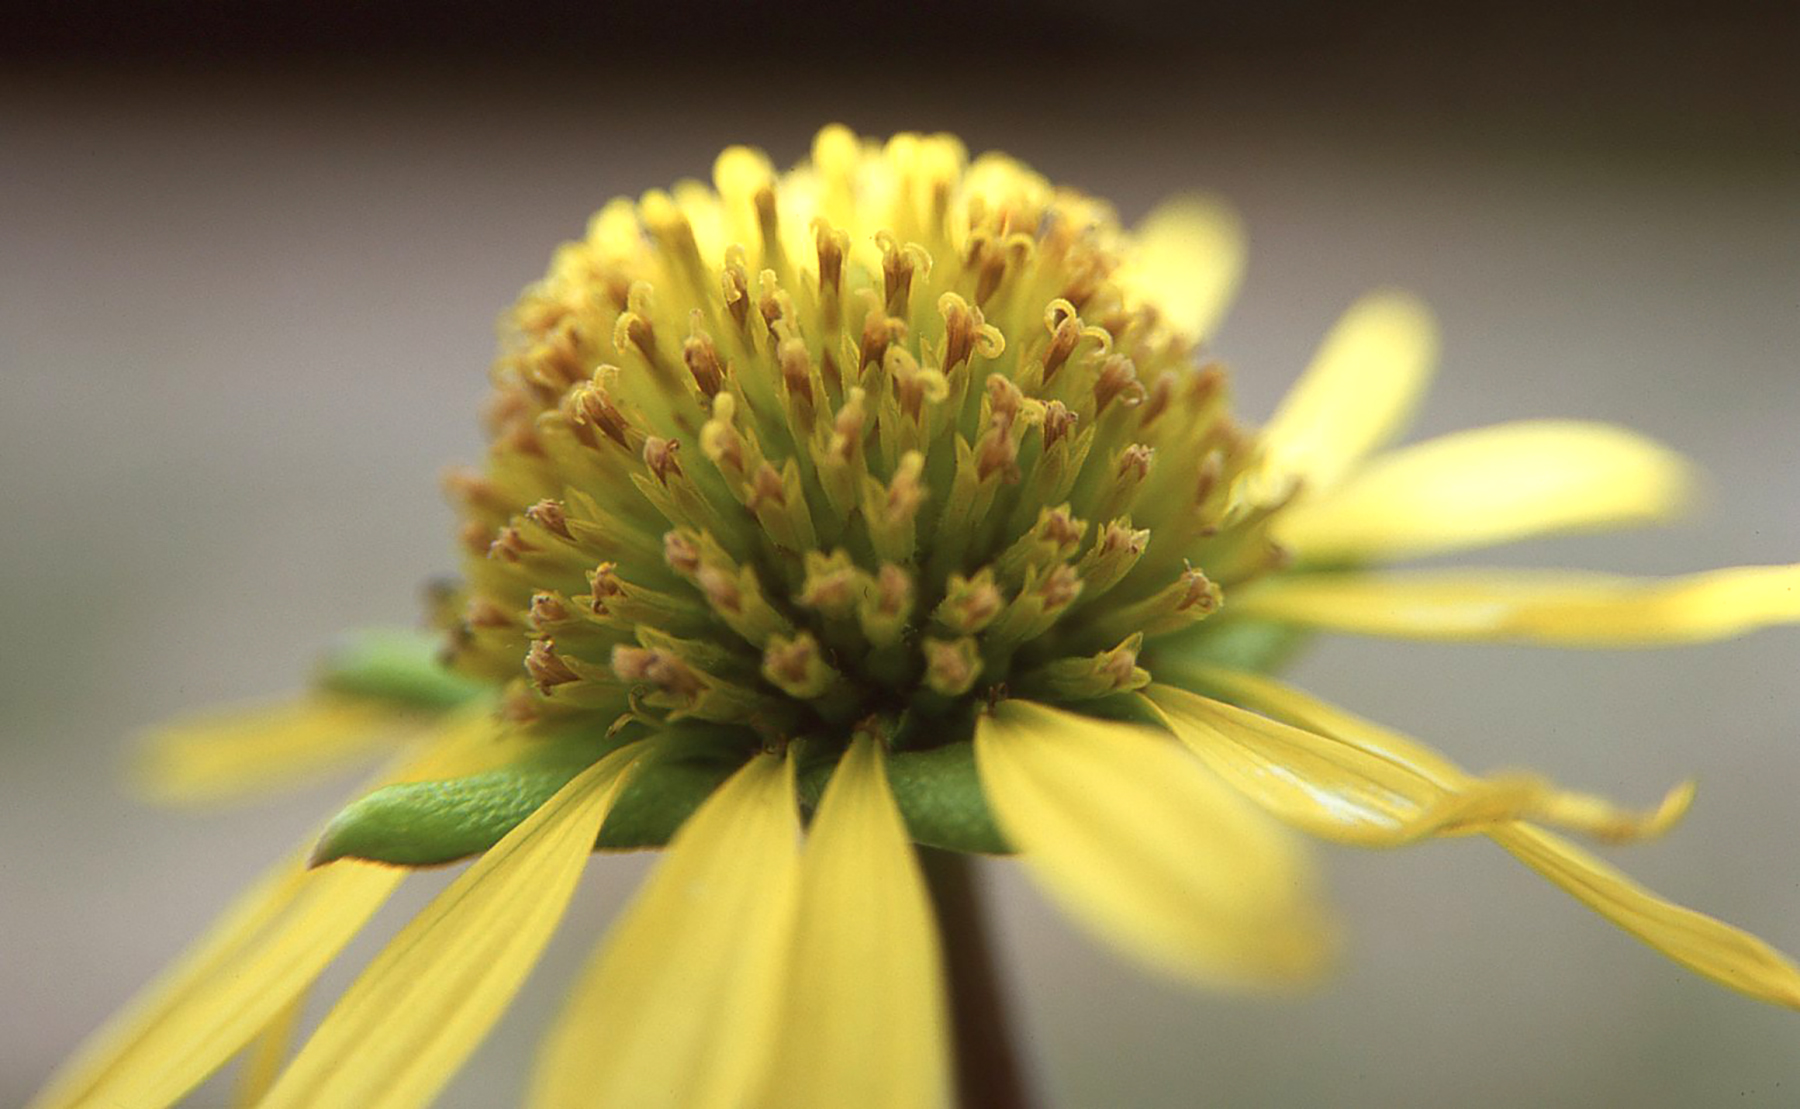 Texas Wildflower | Nikon N80 | Fuji Velvia 50 | Barbara Justice